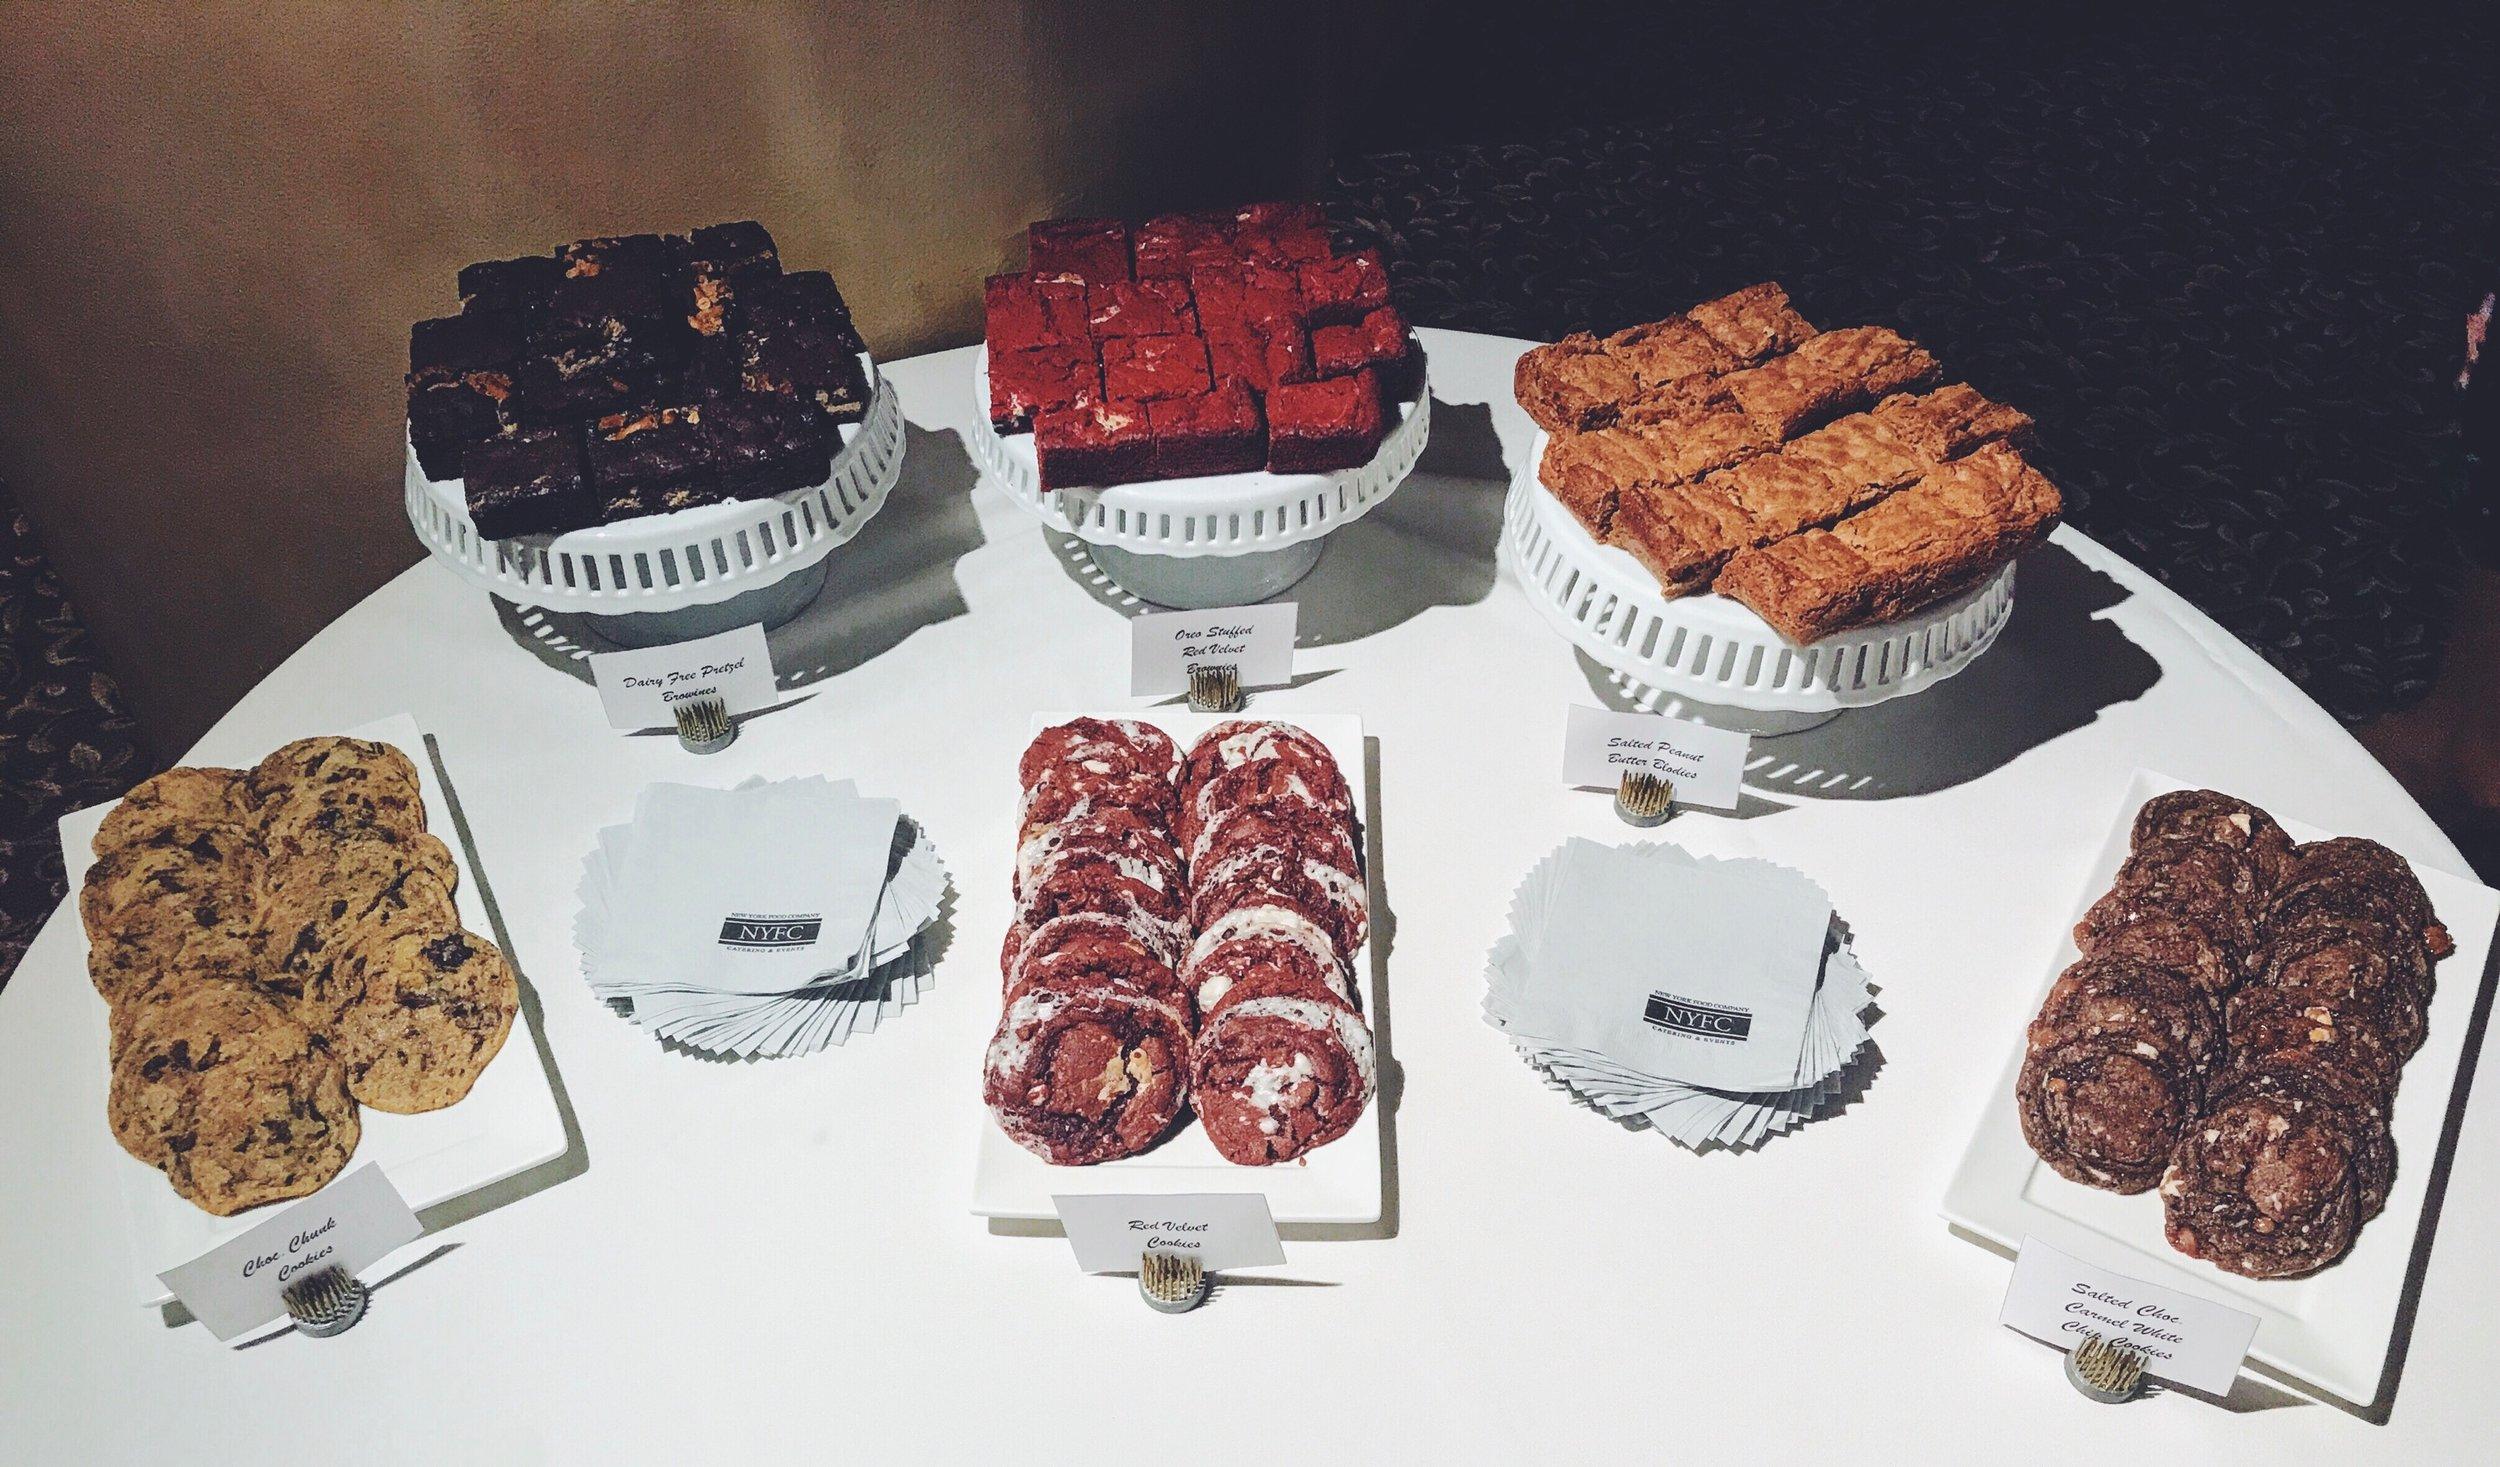 wedding dessert table of gluten free cookies, brownies, and blondies .. @carly.rose_k & @caguirre5